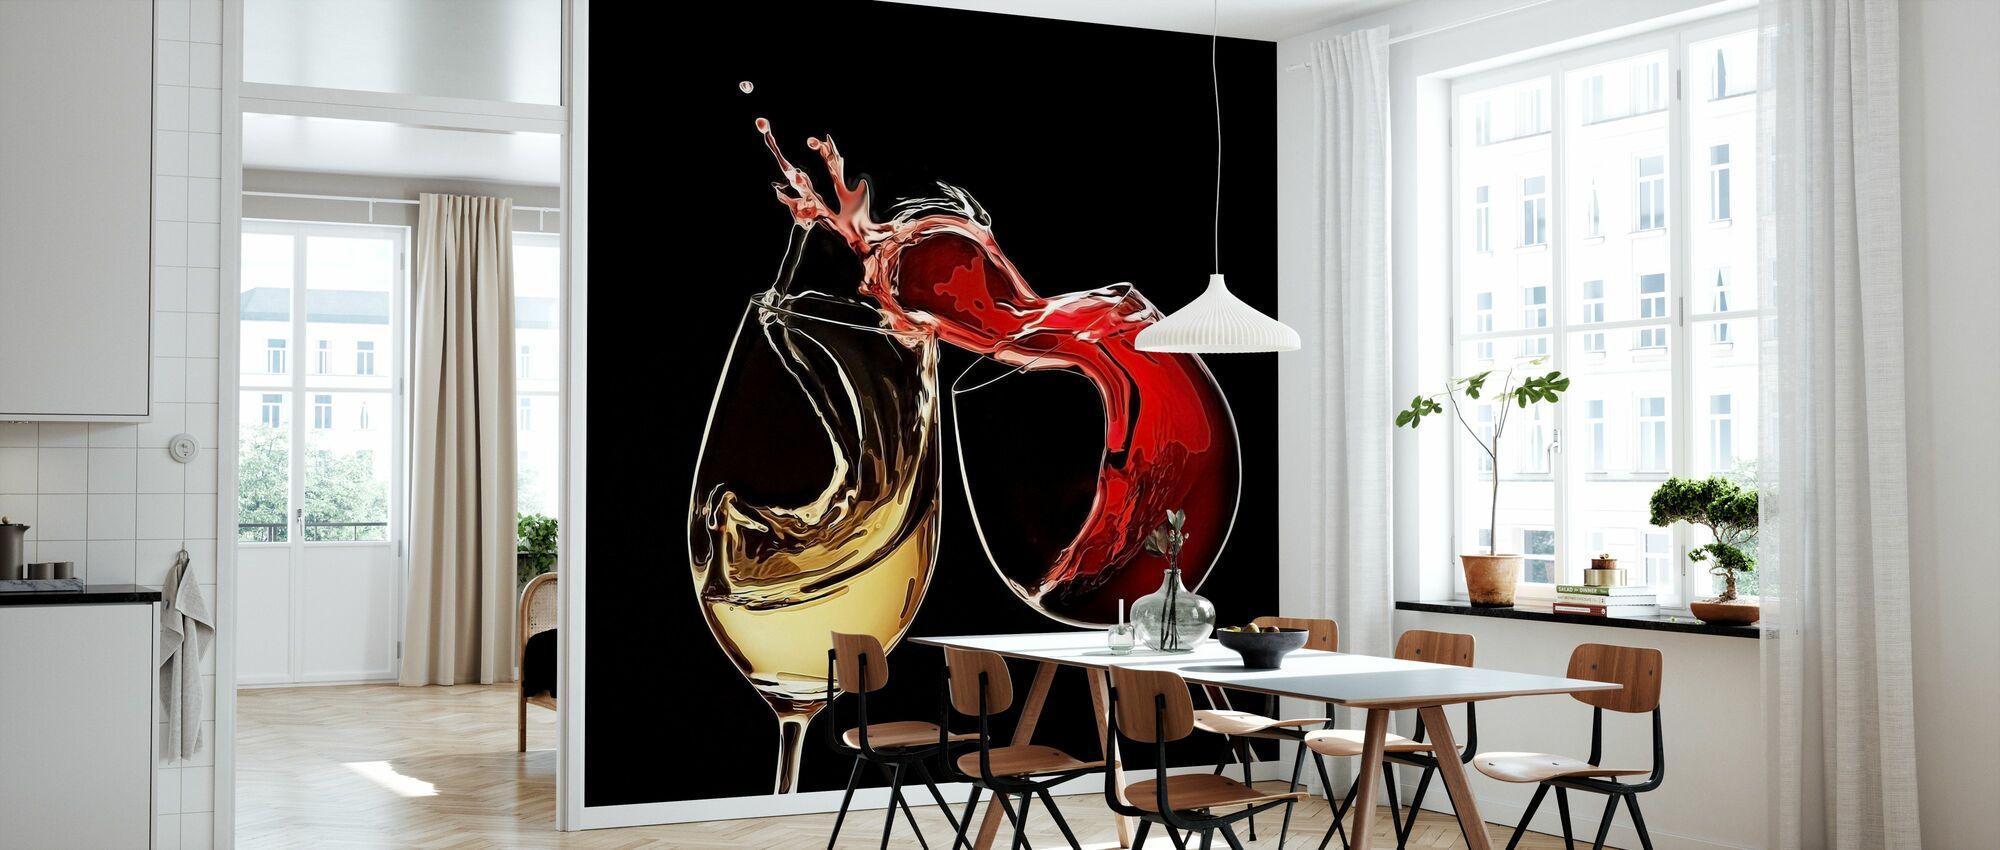 Cheers - Wallpaper - Kitchen